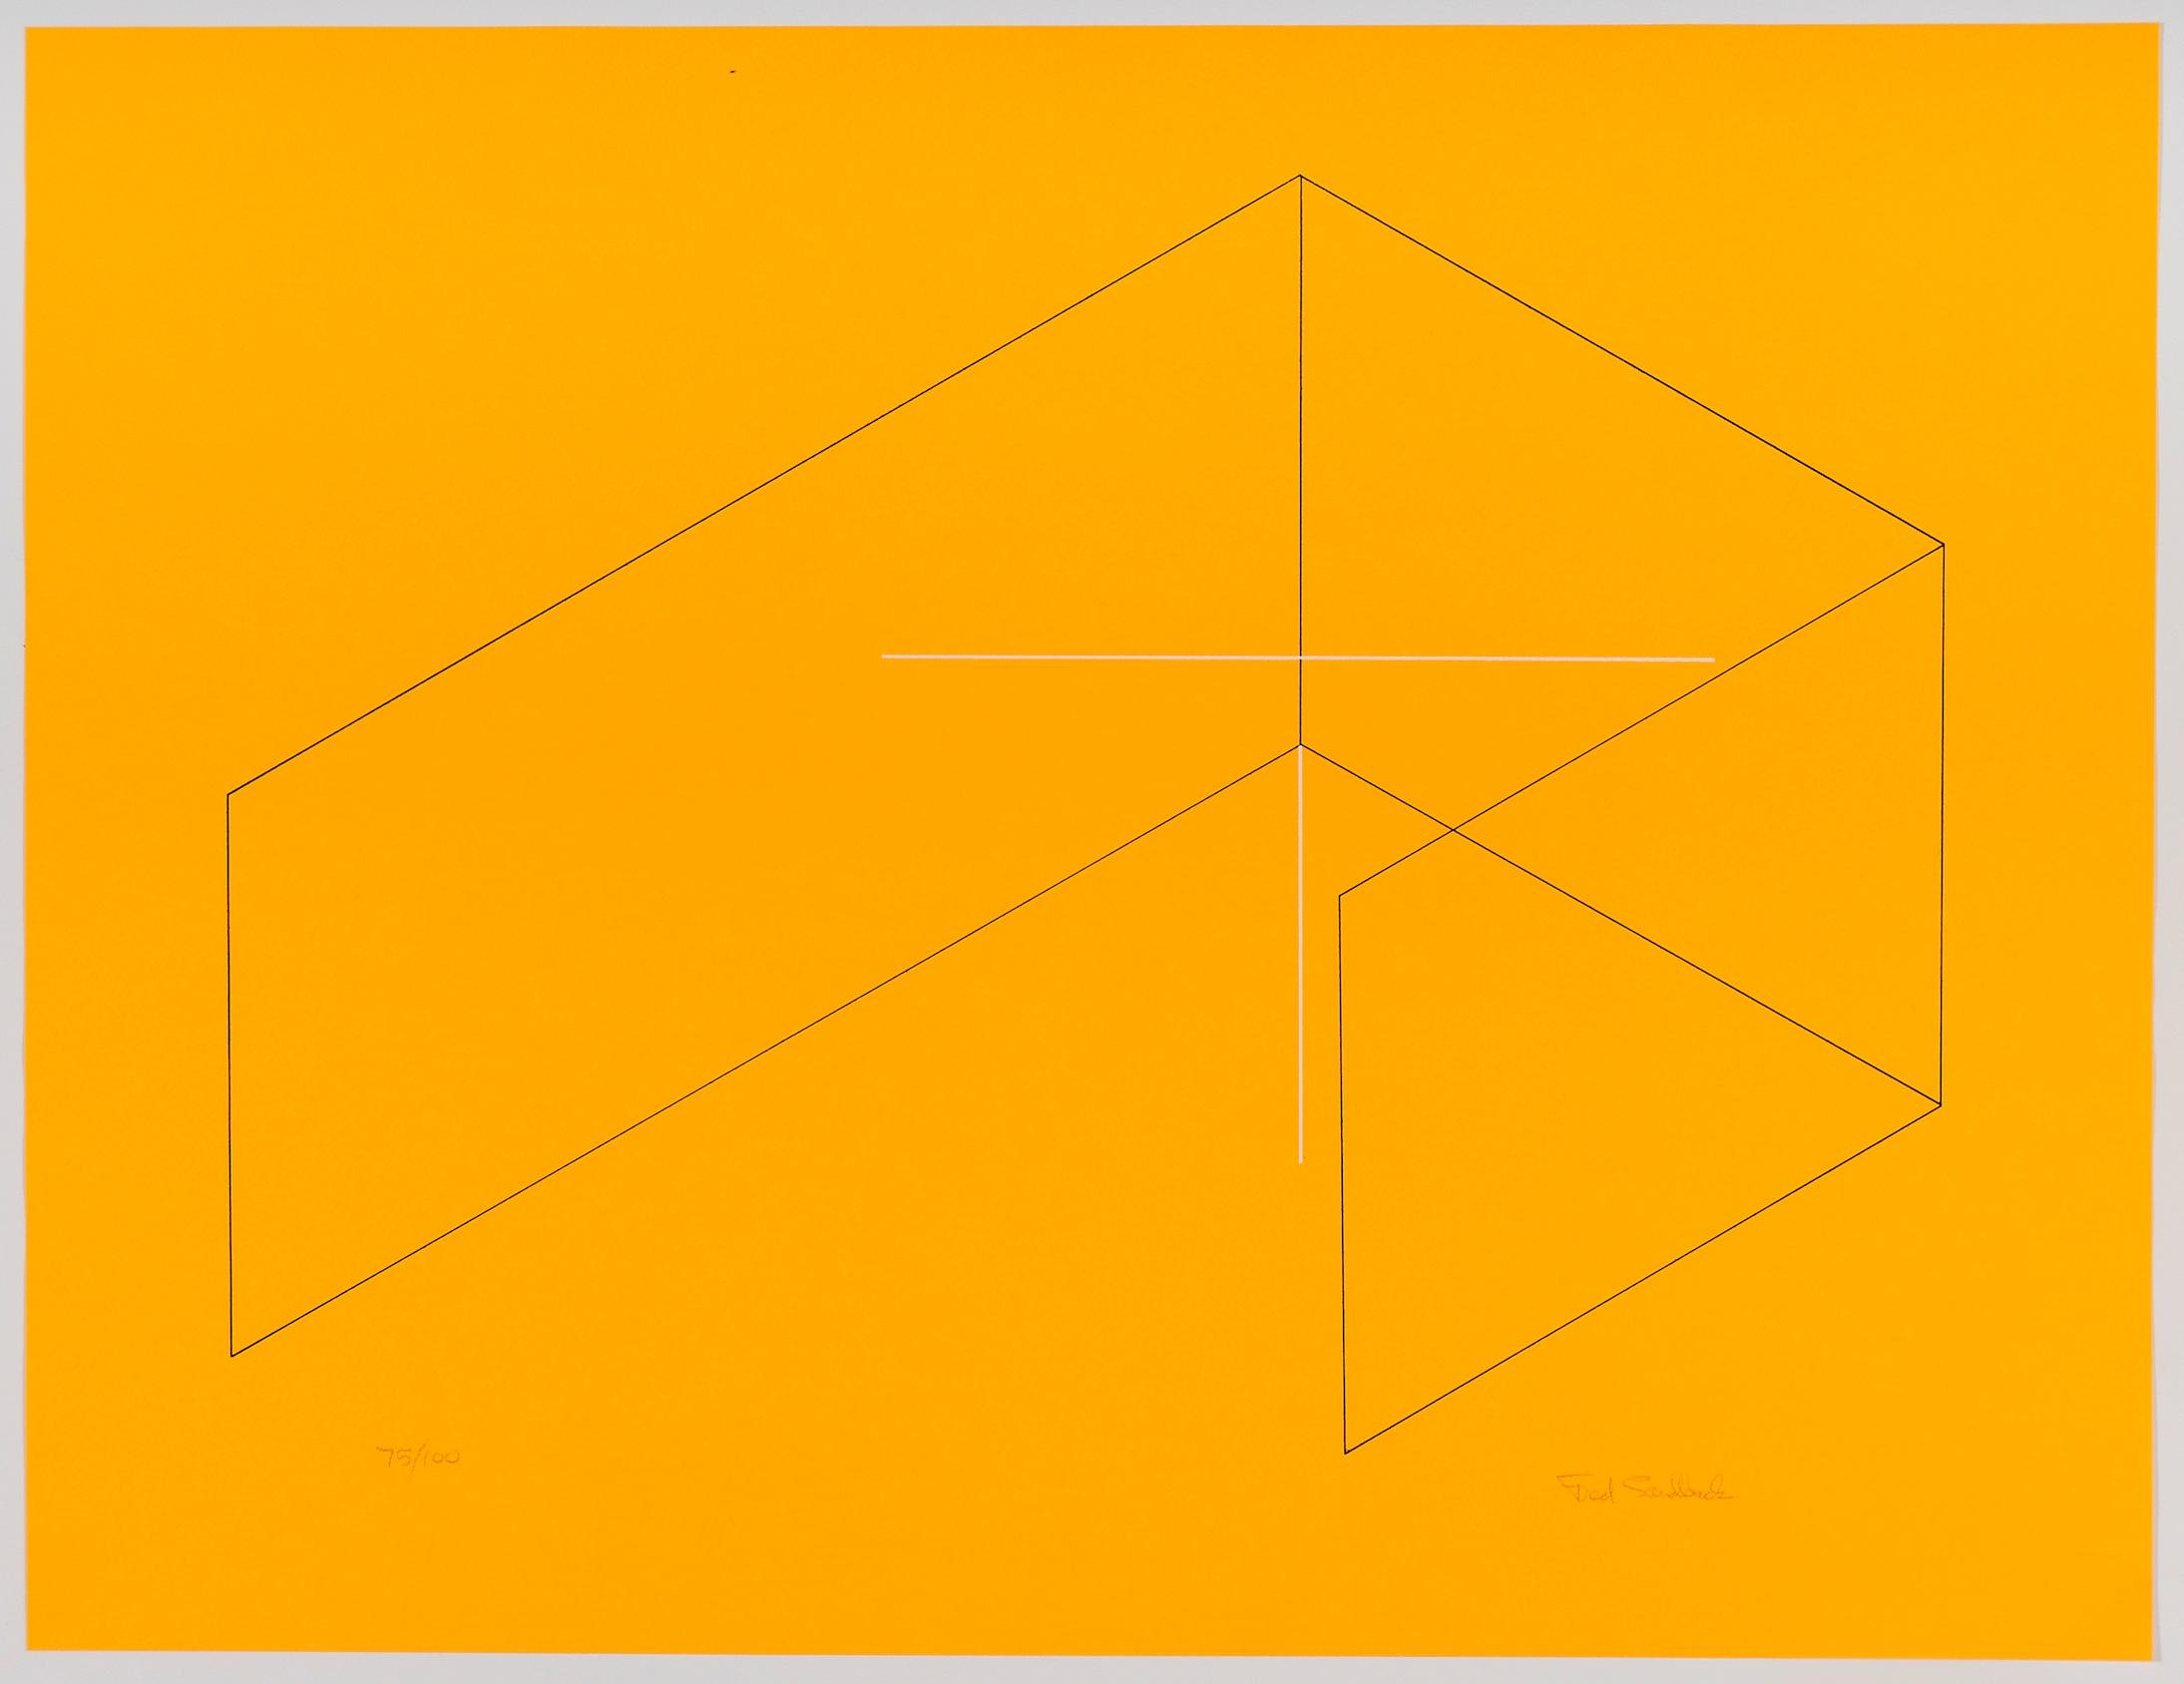 Fred Sandback, Untitled, 1970, Silkscreen on paper